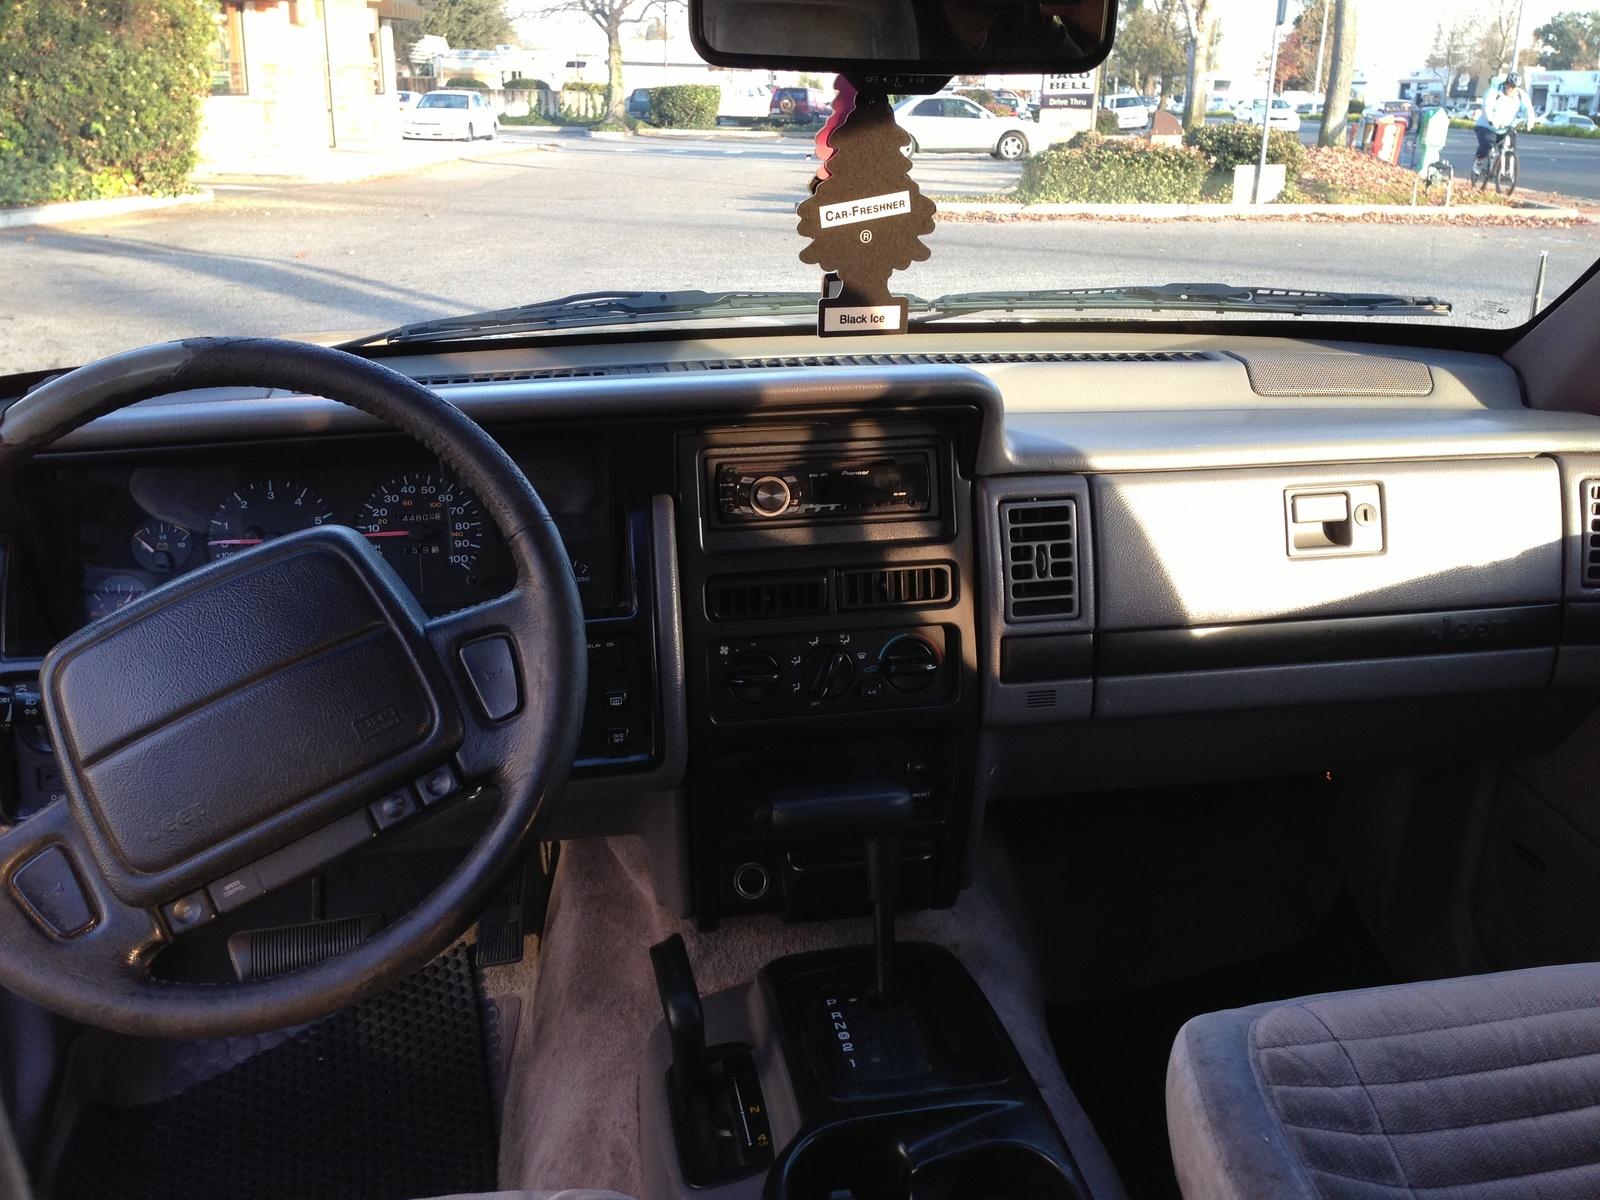 Wip beta released 1994 jeep grand cherokee trail ready v - Jeep grand cherokee laredo interior ...